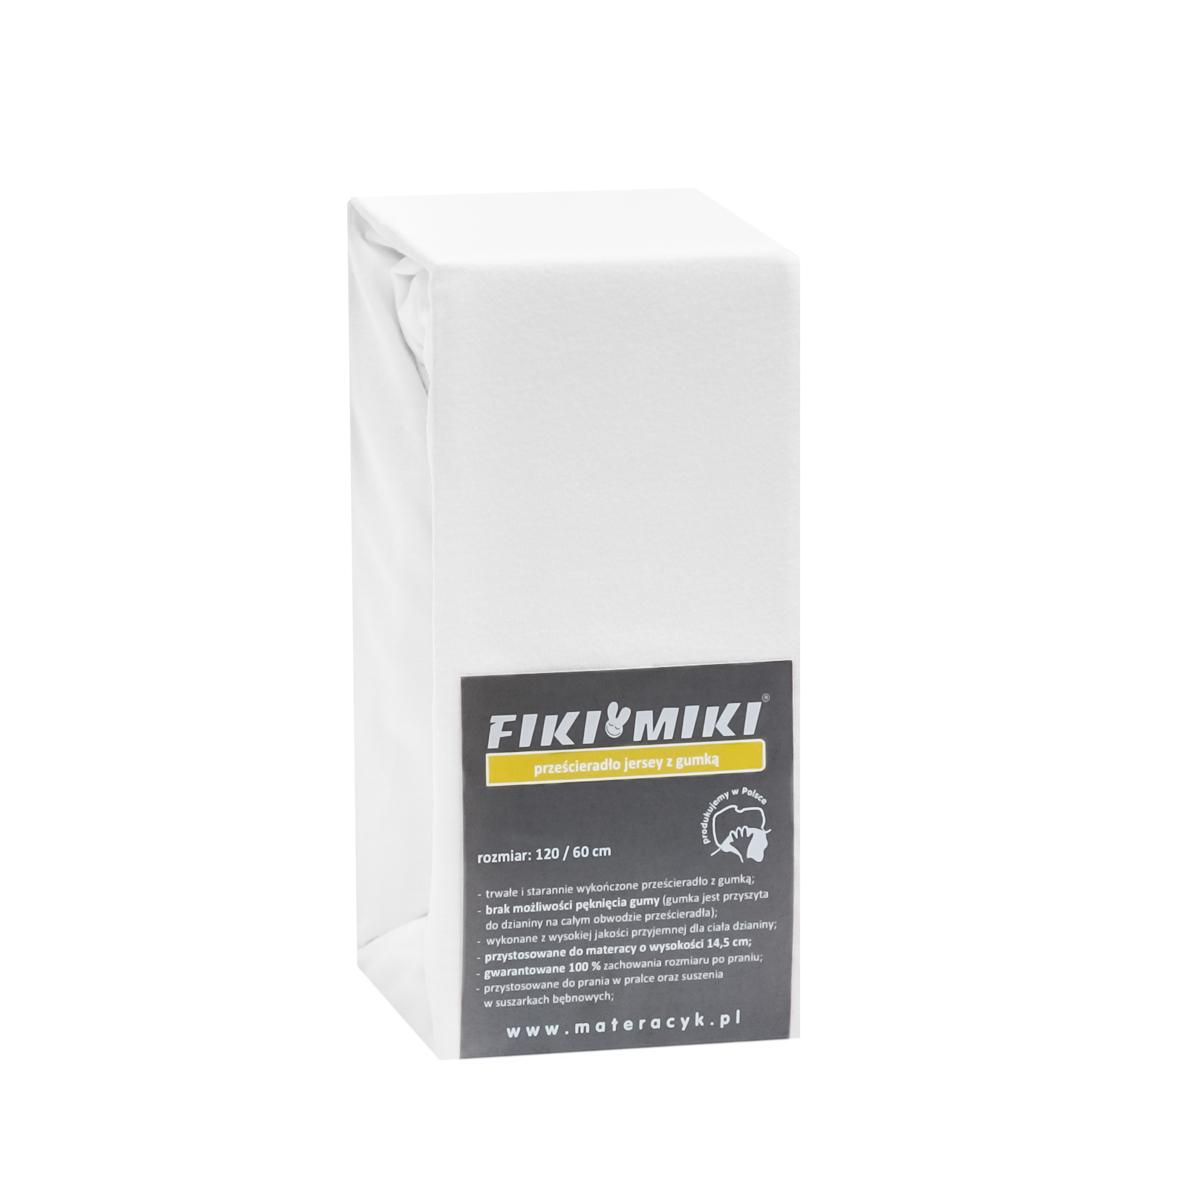 Cearsaf cu elastic jerse din bumbac alb 120/60 cm imagine